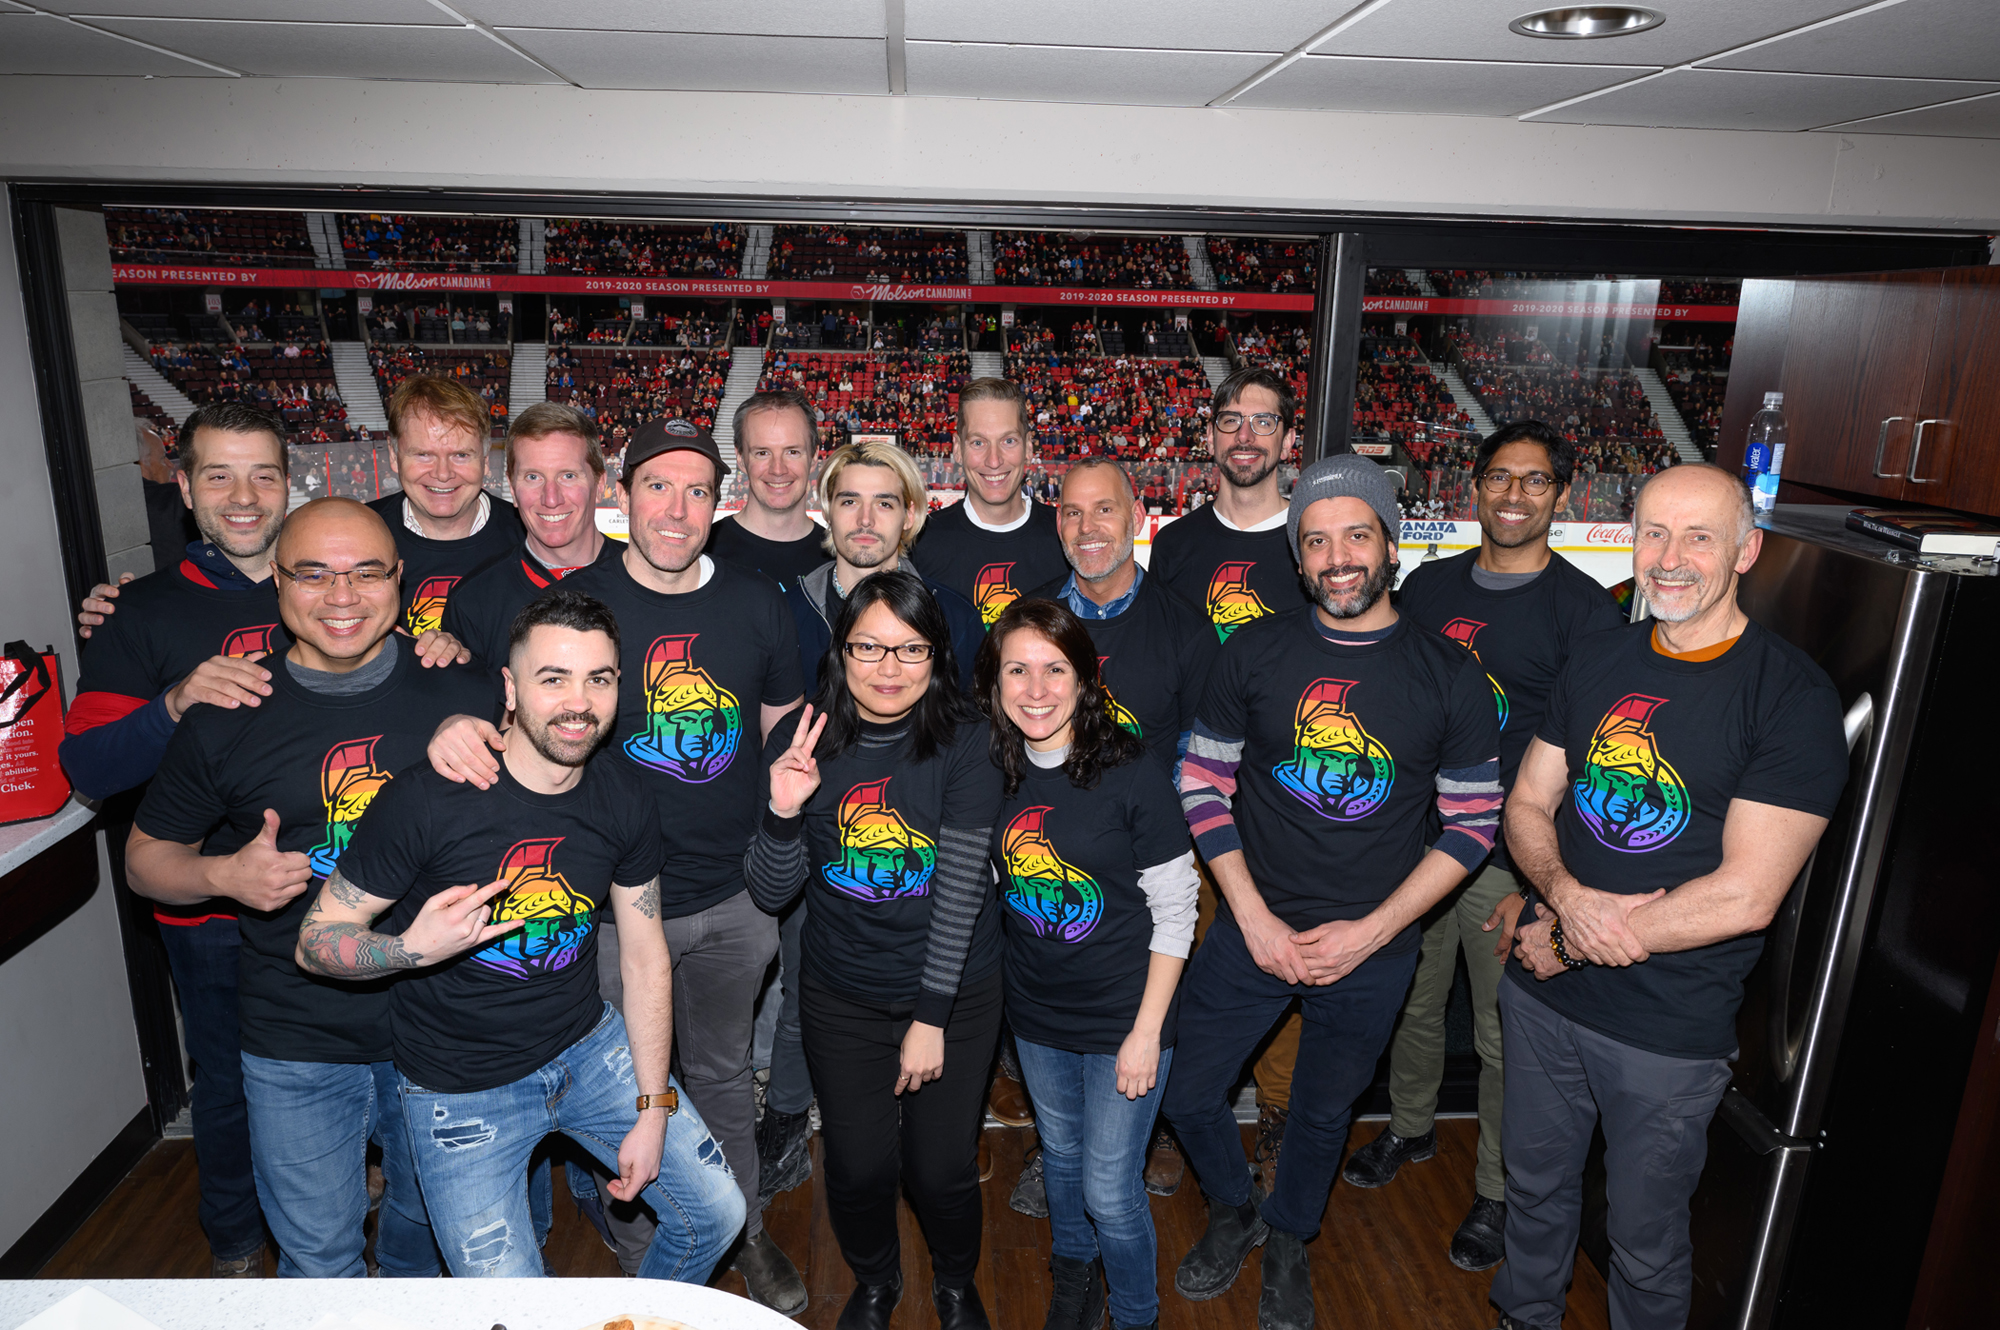 club rencontre gay history à Bagnolet